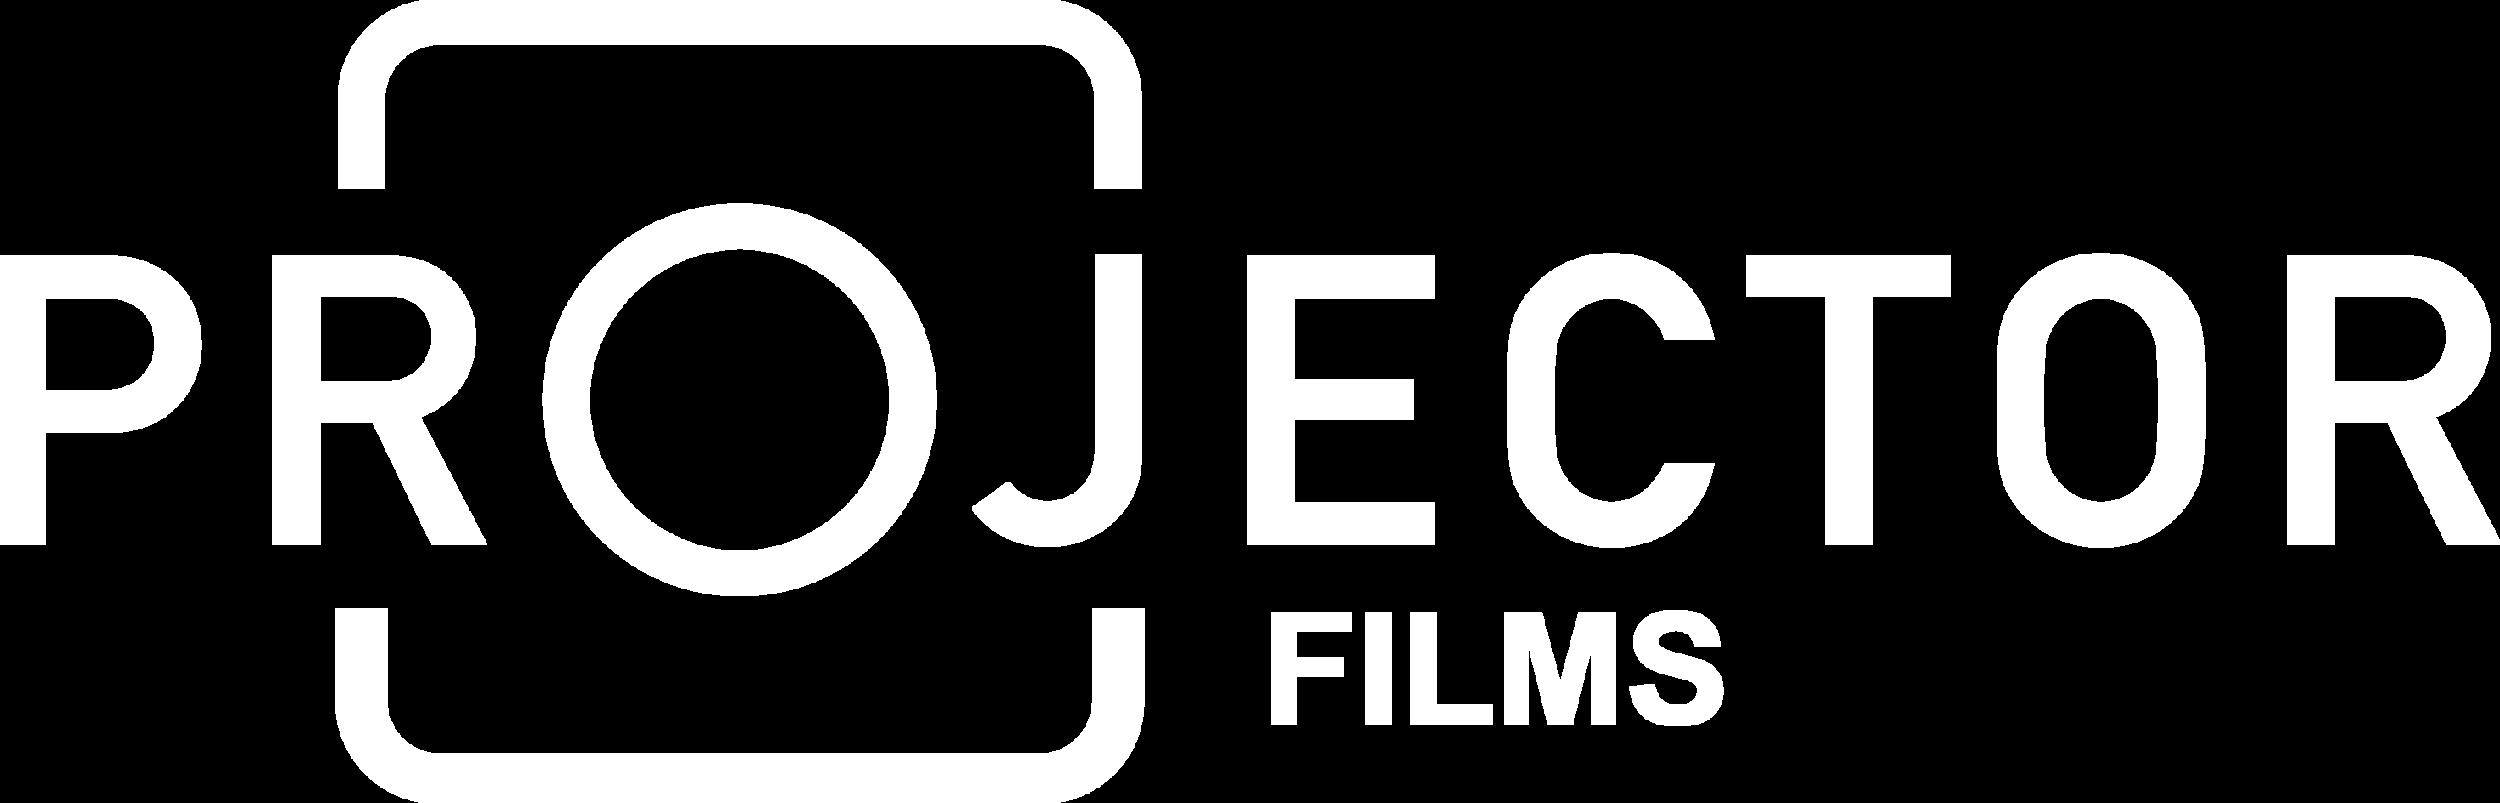 Projector Films.png